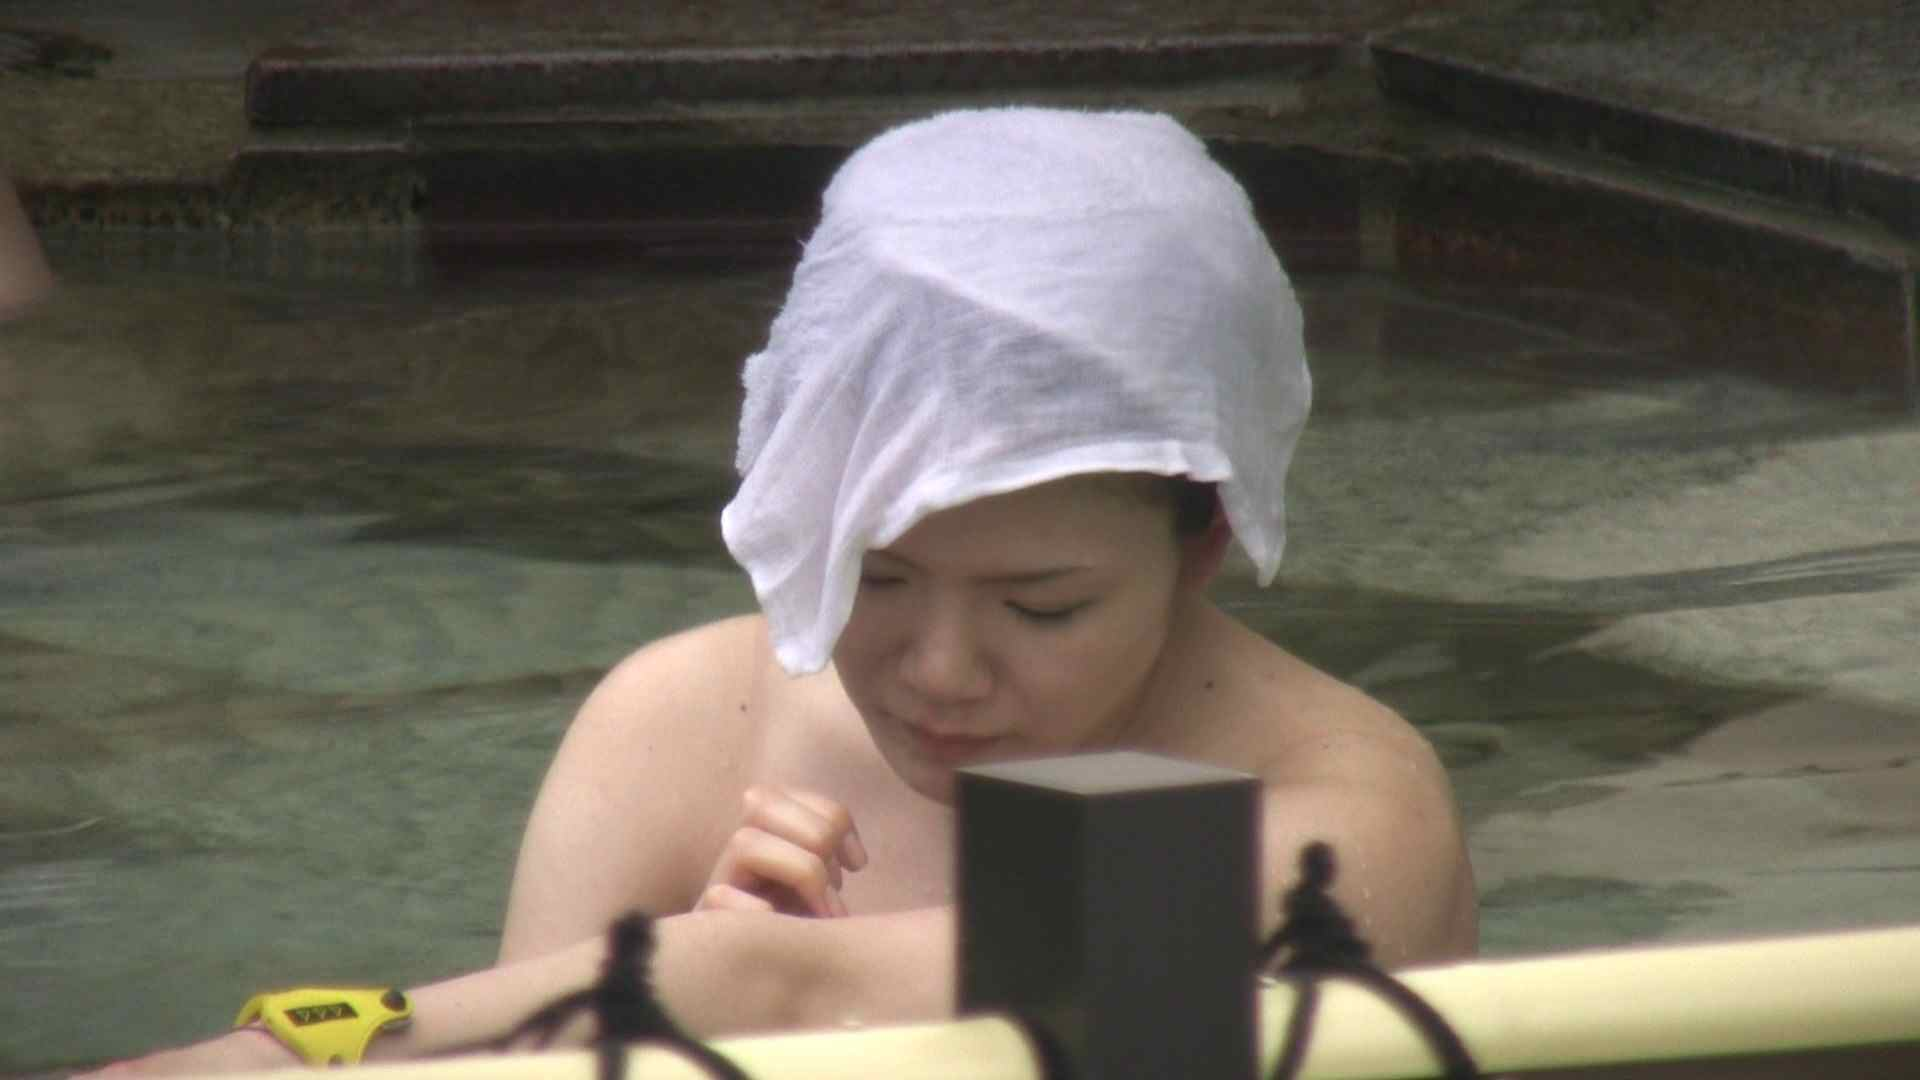 Aquaな露天風呂Vol.12【VIP】 HなOL | 盗撮  83pic 62